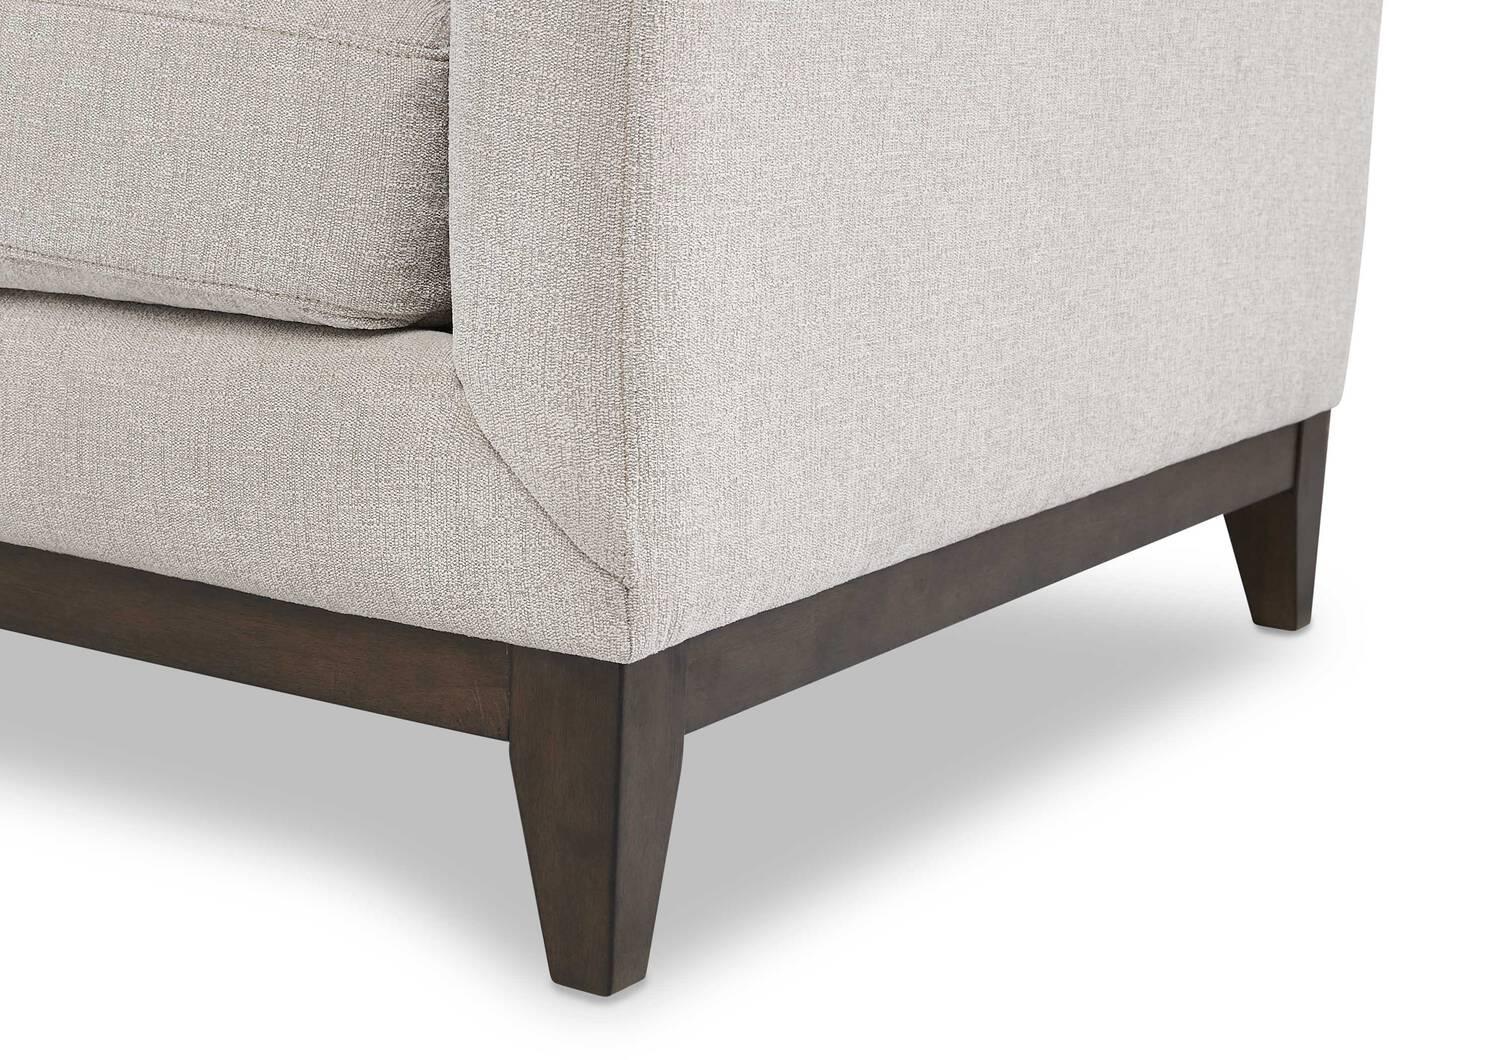 Ryerson Sofa -Rogen Stone